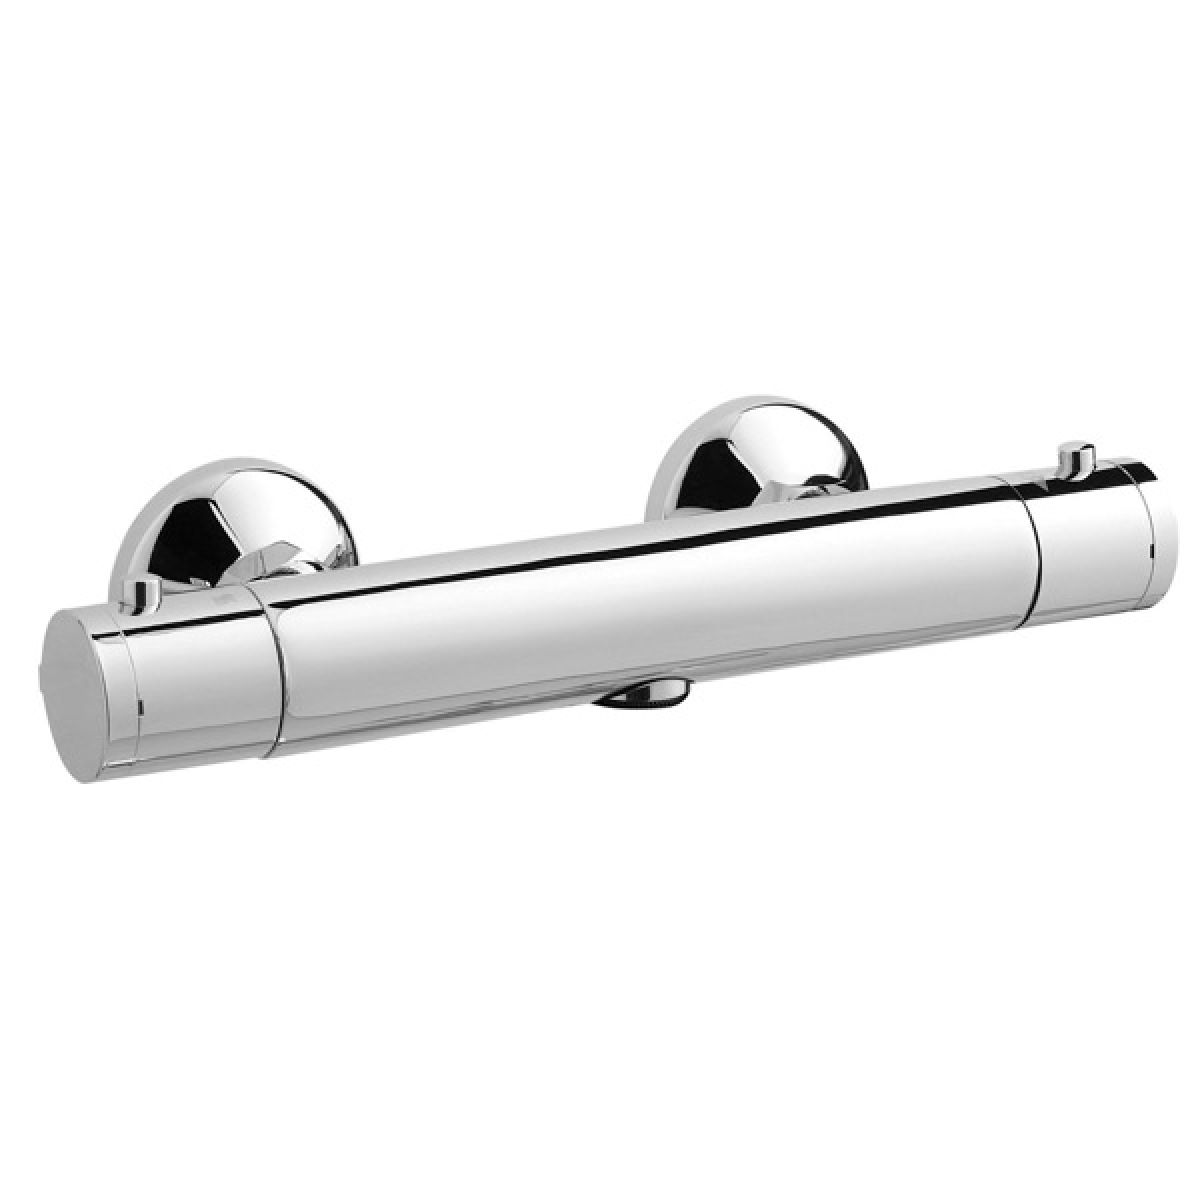 Ultra Minimalist Thermostatic Bar Shower Valve Low Pressure